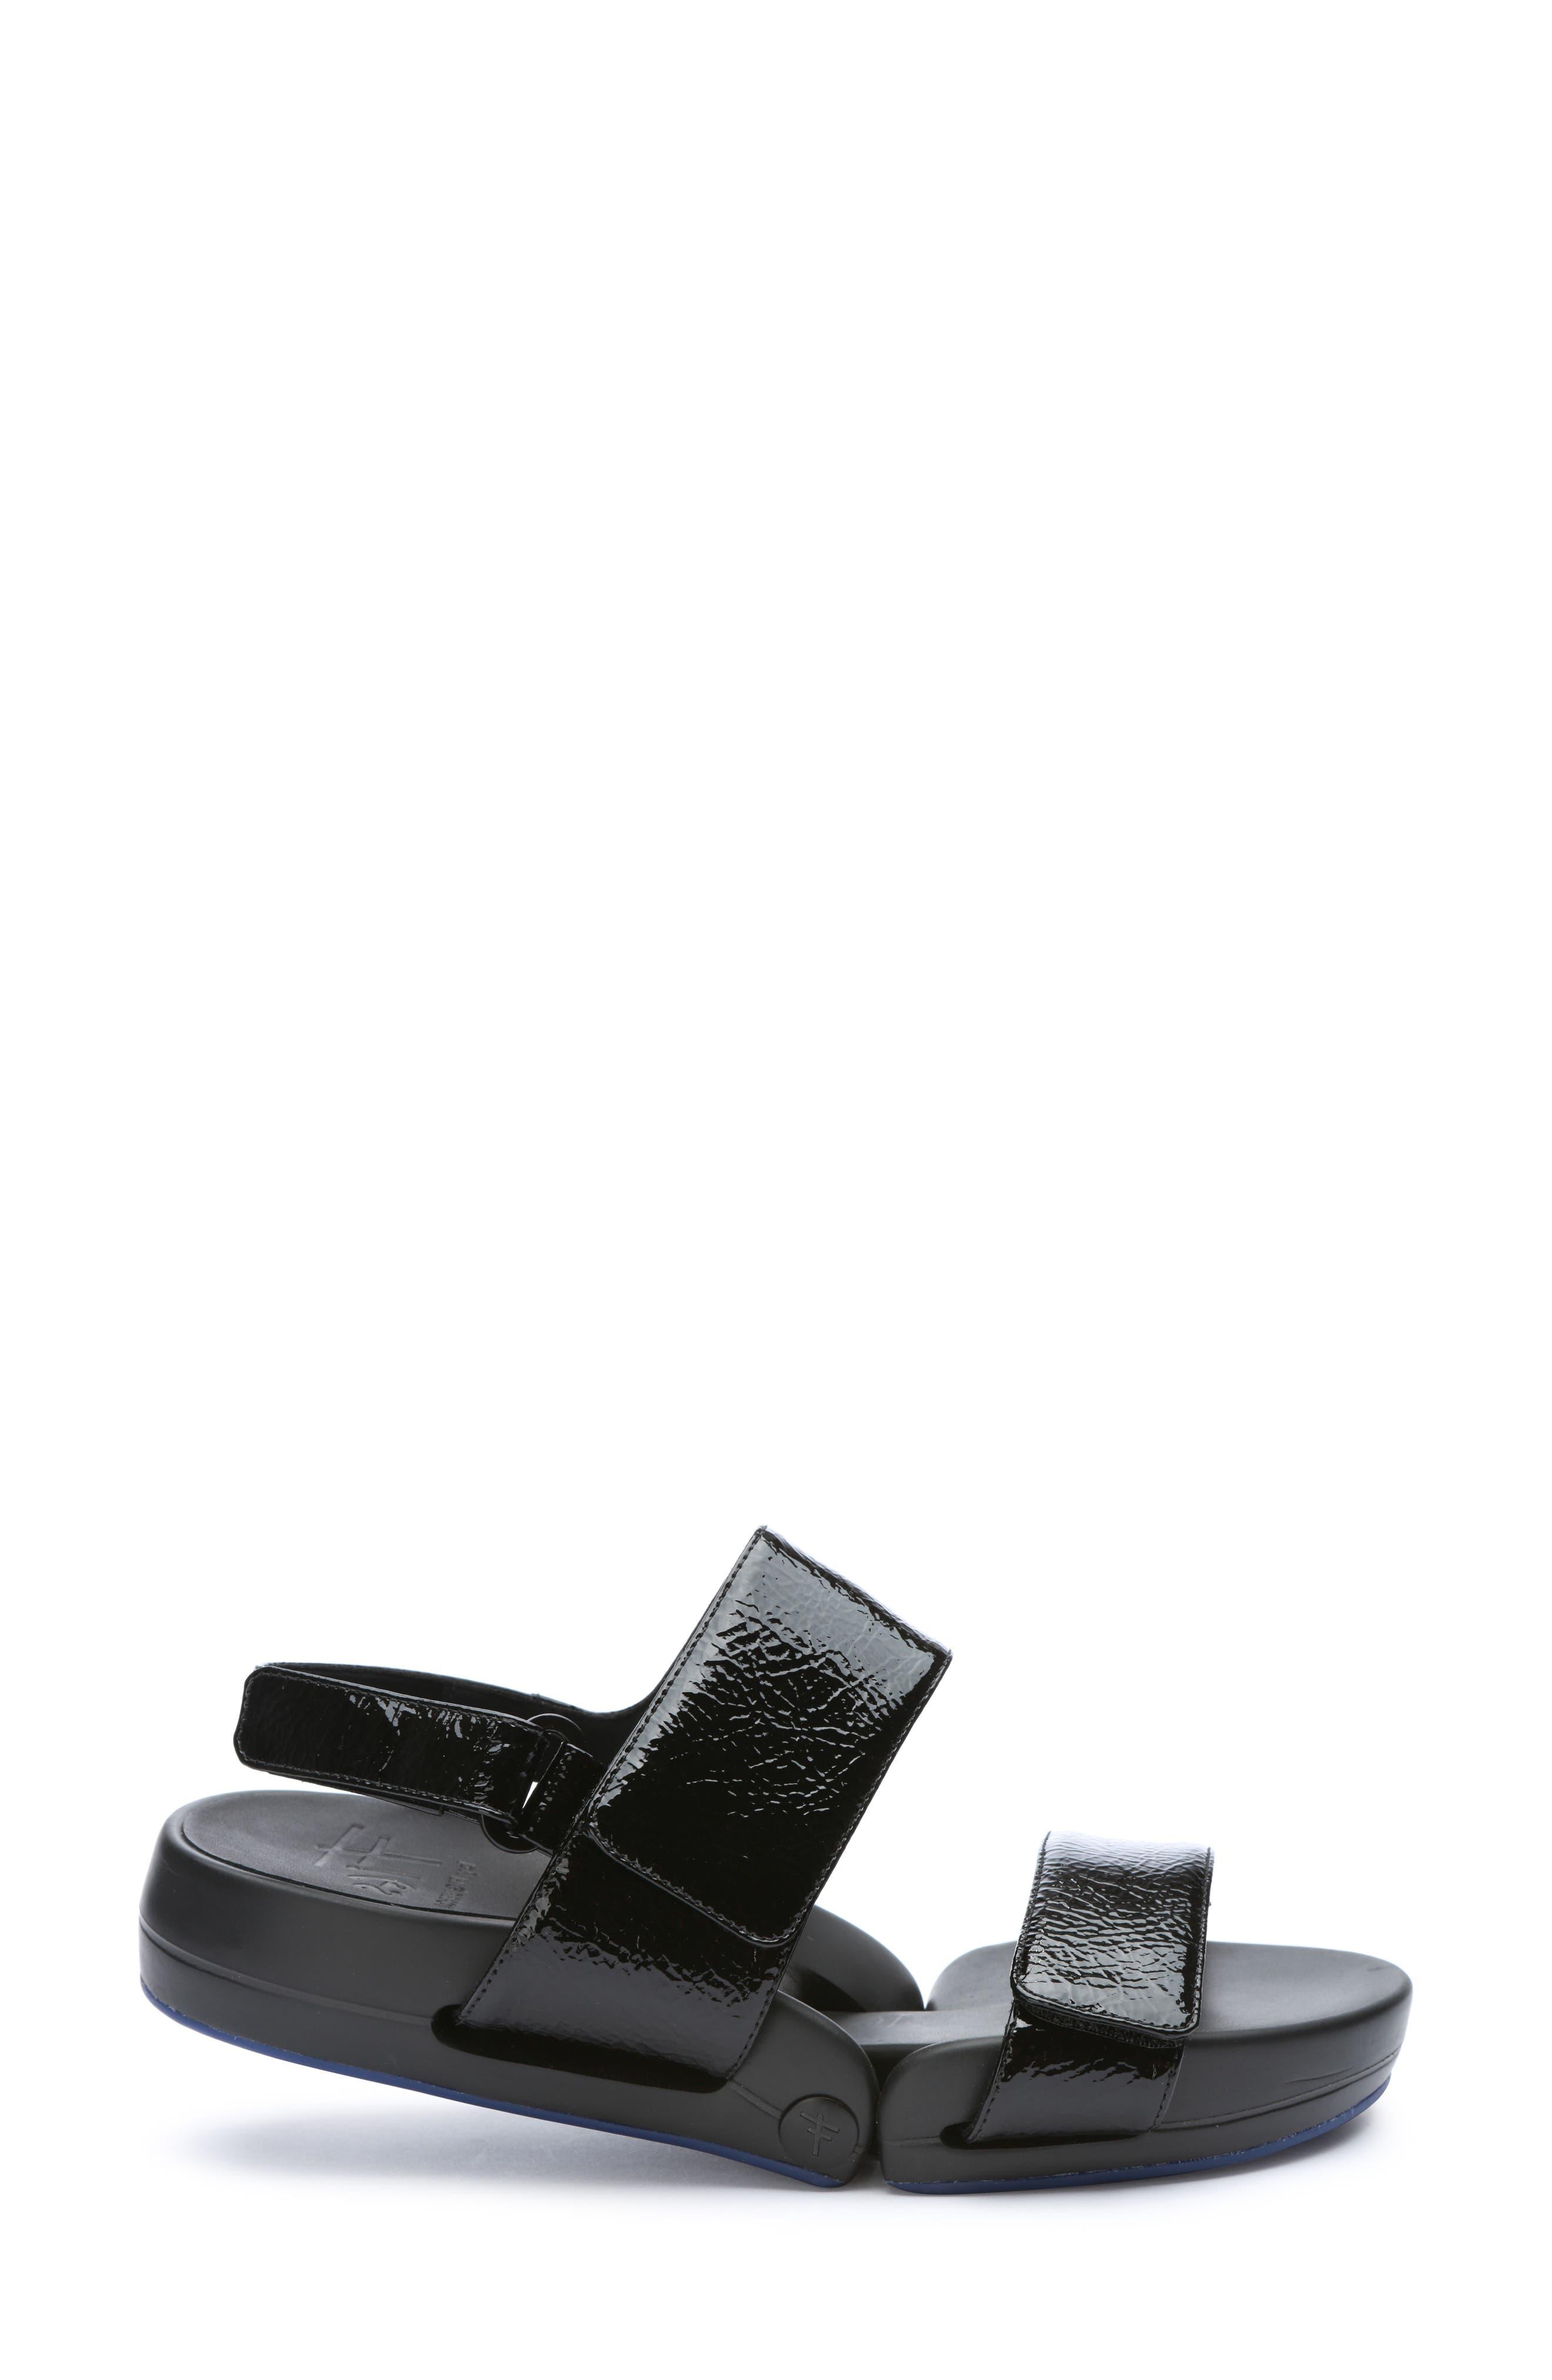 Figulous Sandal,                             Alternate thumbnail 3, color,                             BLACK CRINKLE PATENT LEATHER